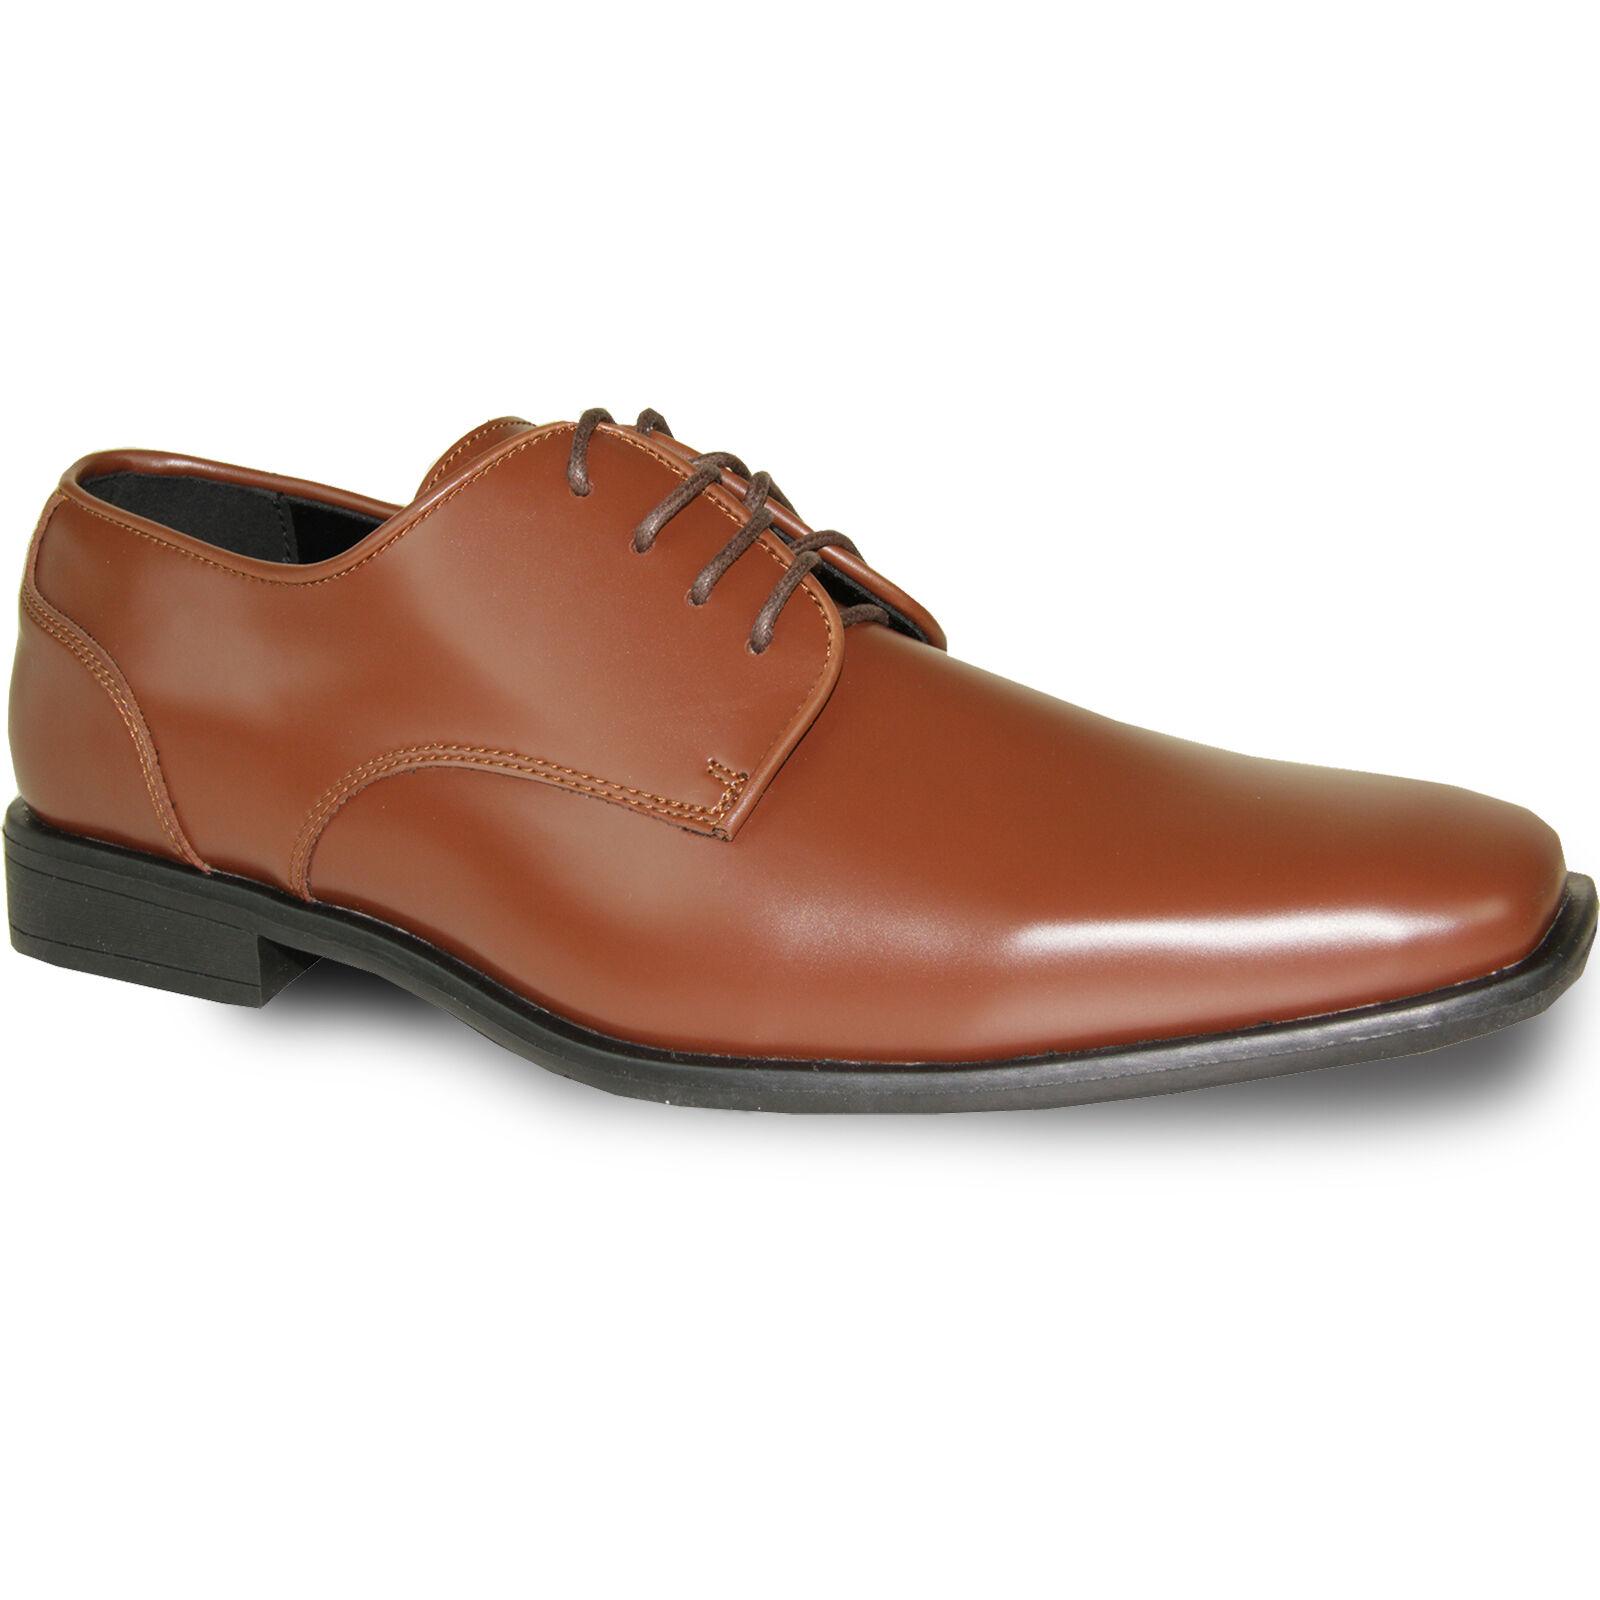 VANGELO New Uomo Dress Shoes TUX-2 Tuxedo For Formal Up Wedding Cognac Size Up Formal to 18 debda8